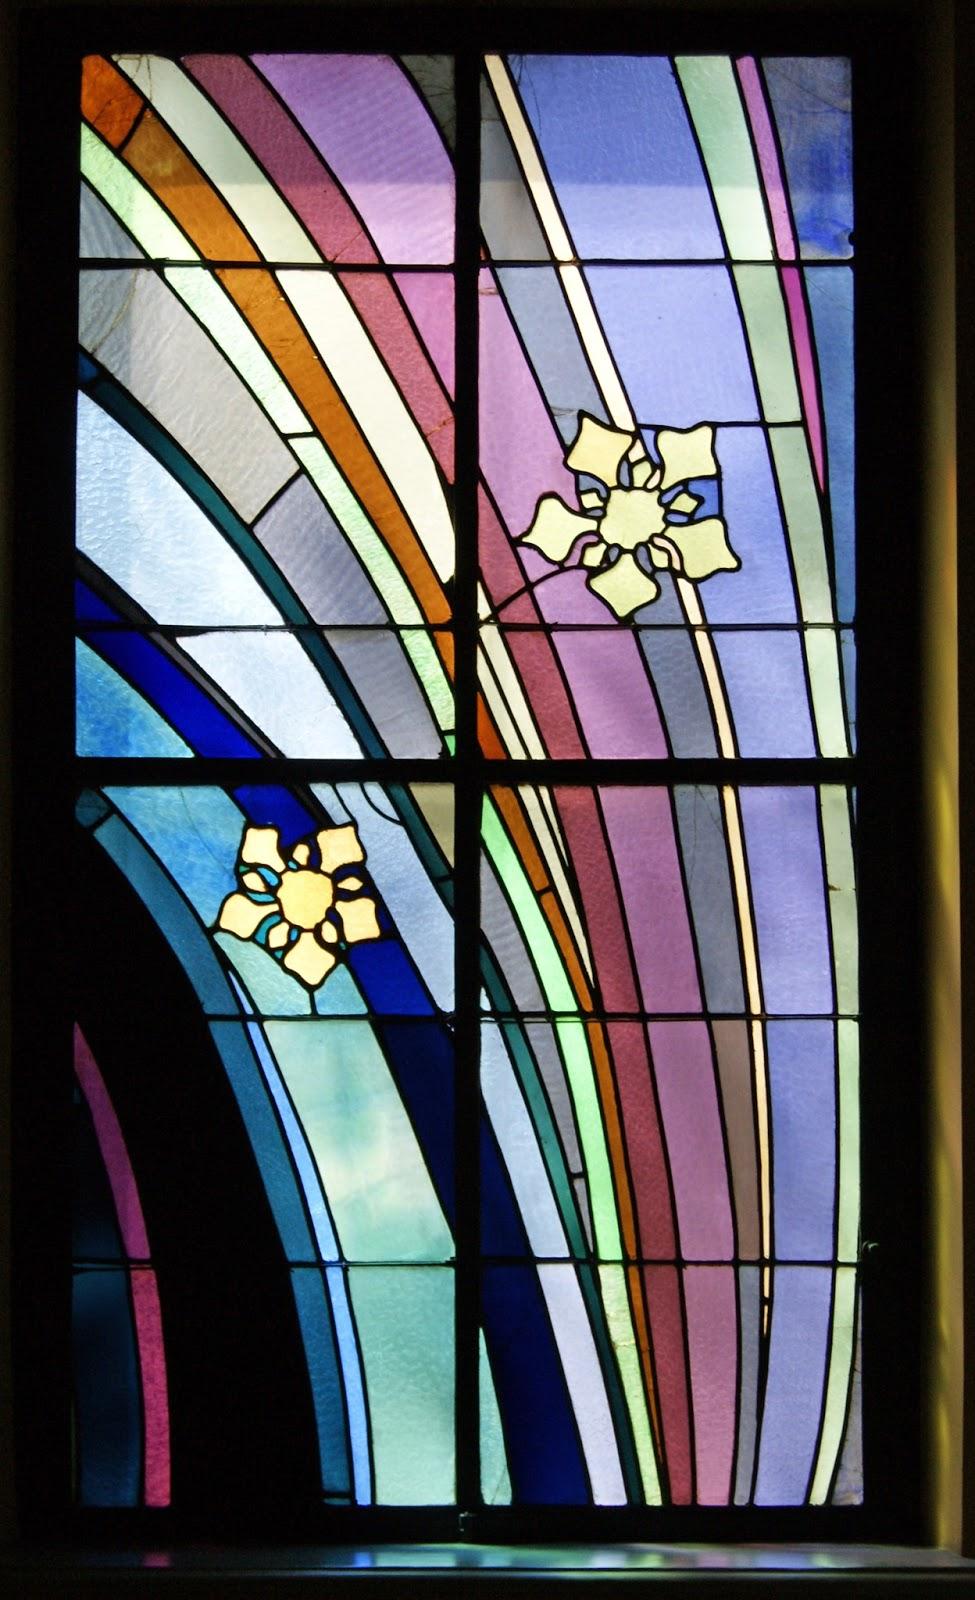 Glass window design - Glass Window Design